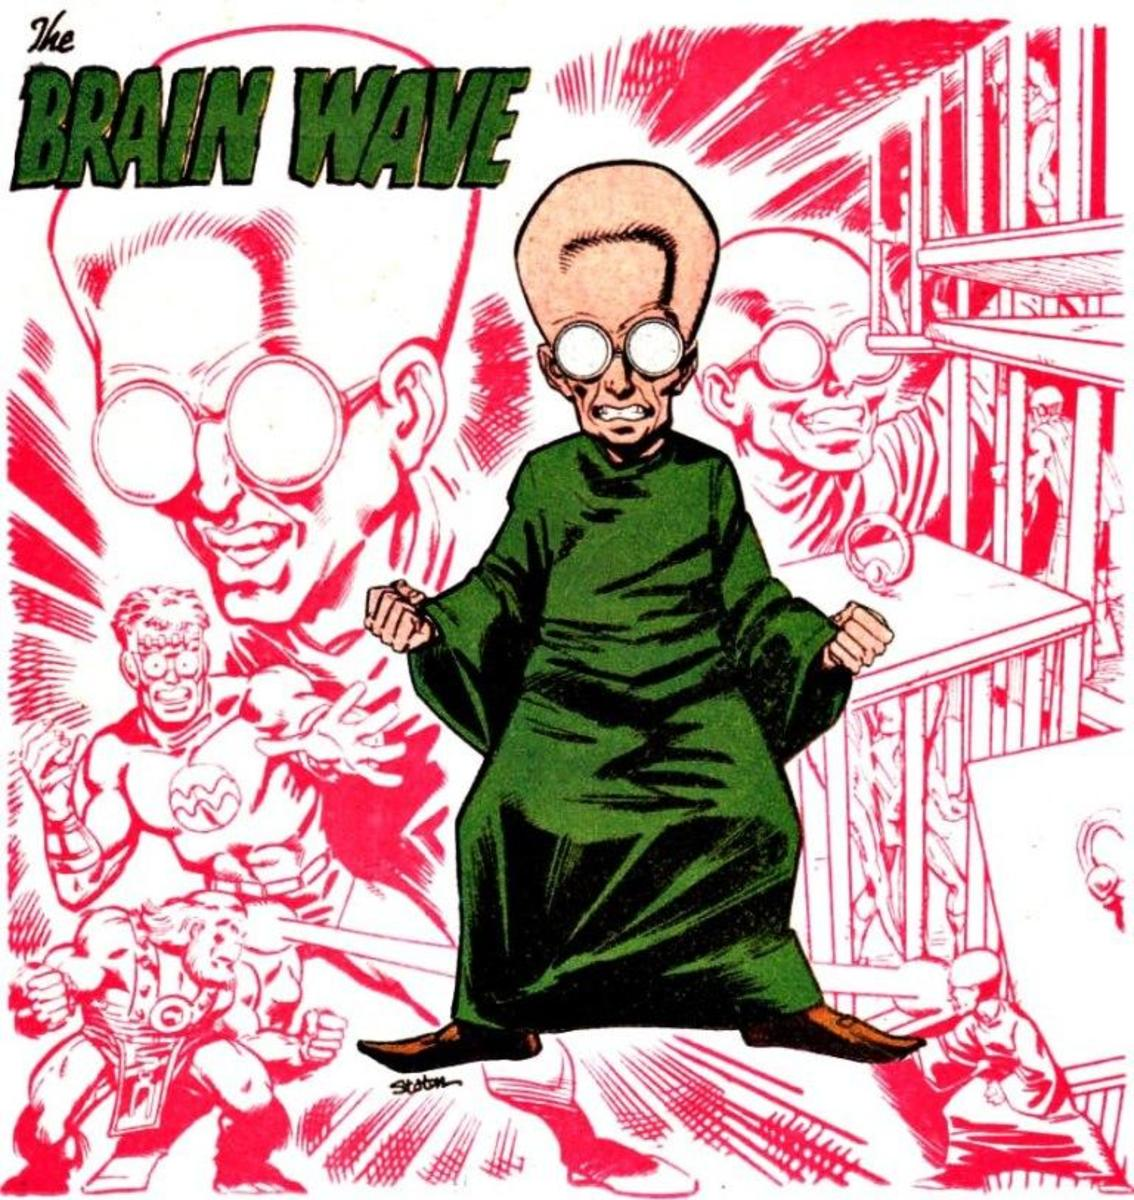 The Original Brainwave